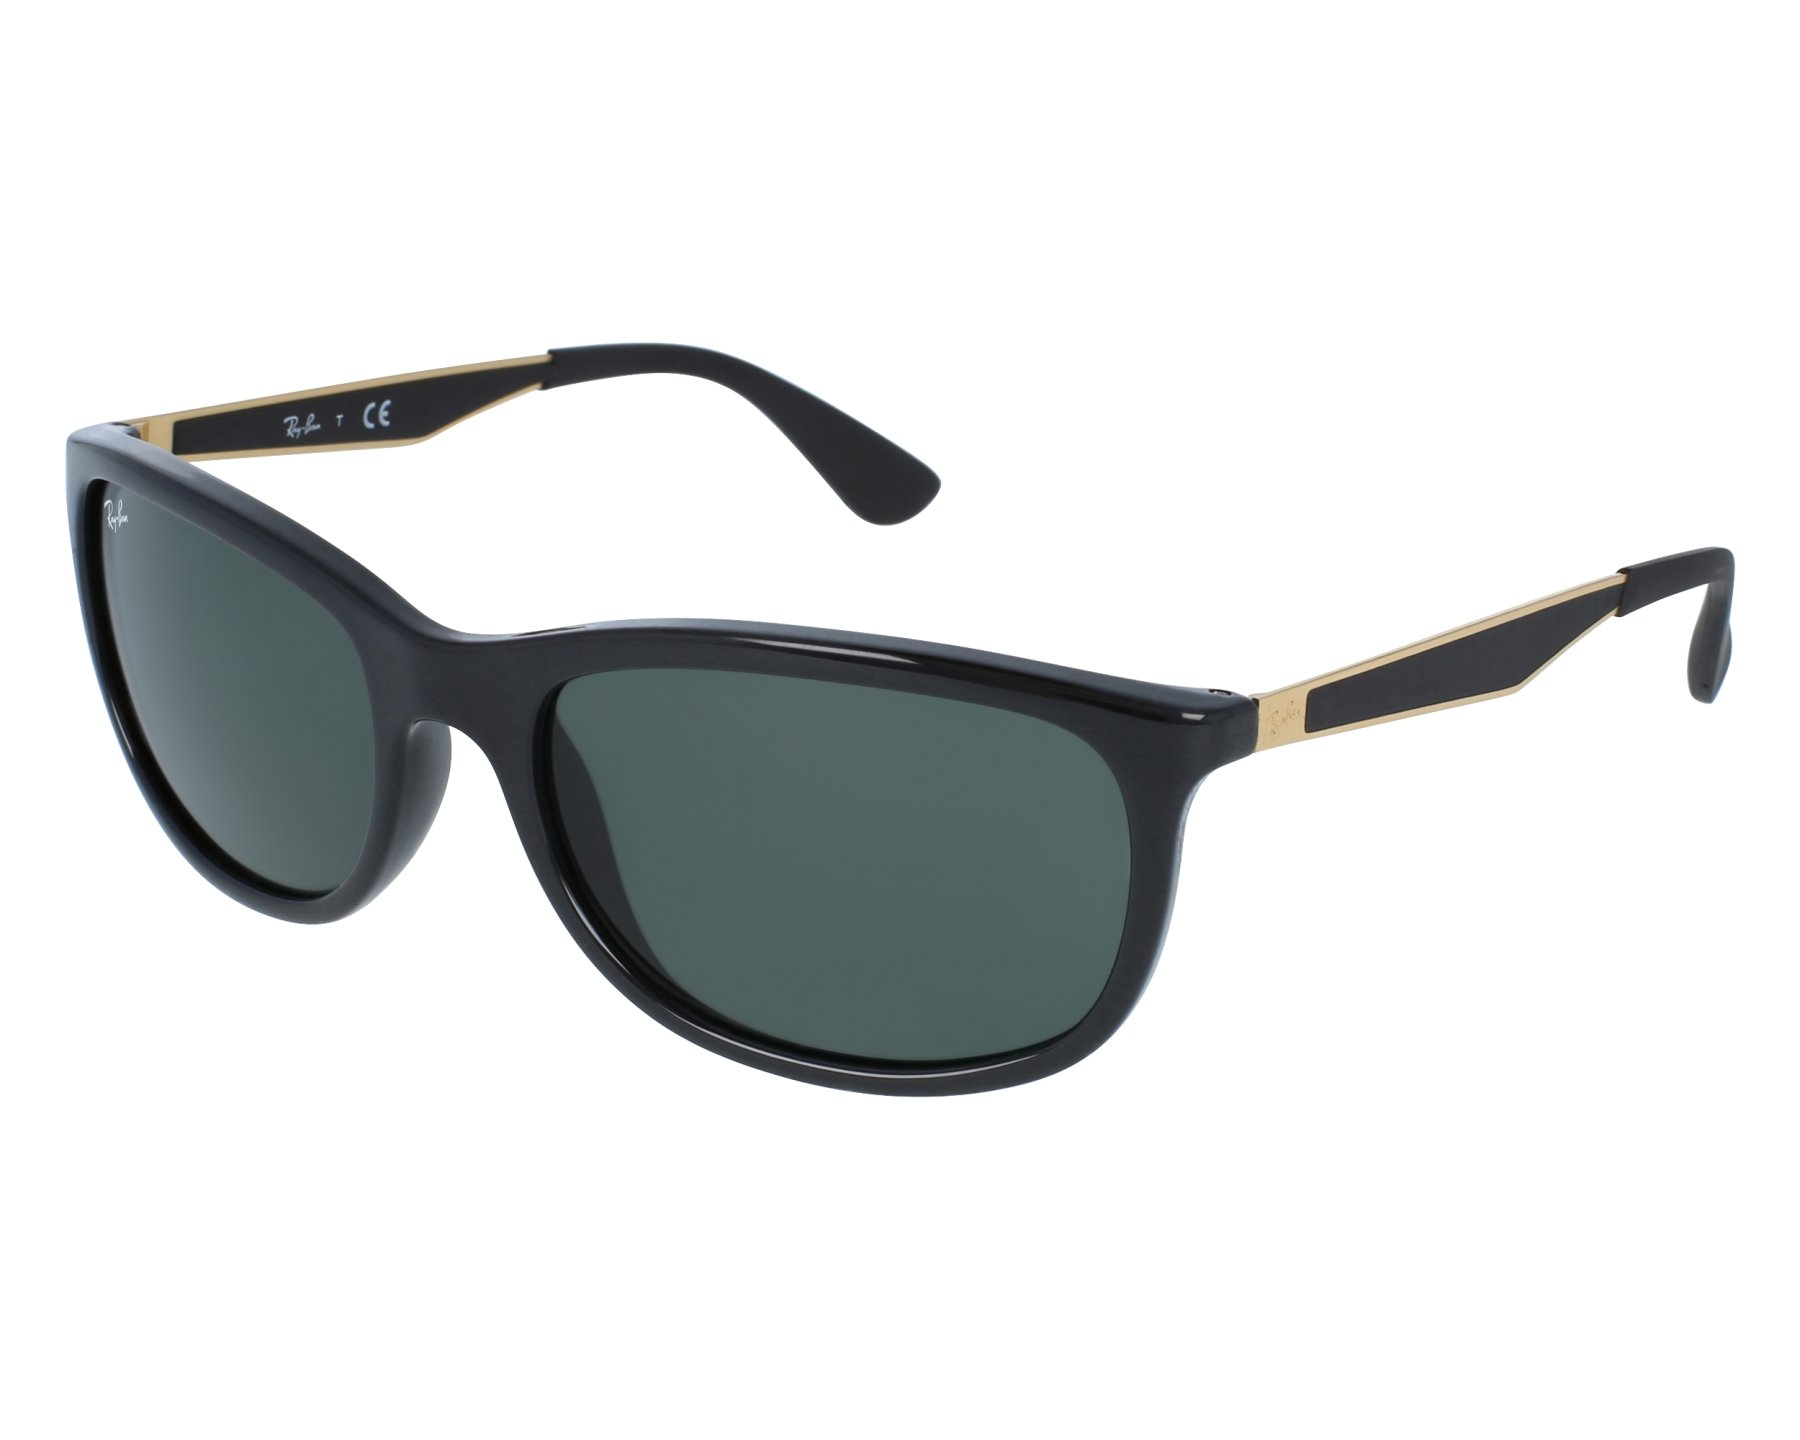 101ea4e5cfe Sunglasses Ray-Ban RB-4267 6227 71 59-19 Black Gold front